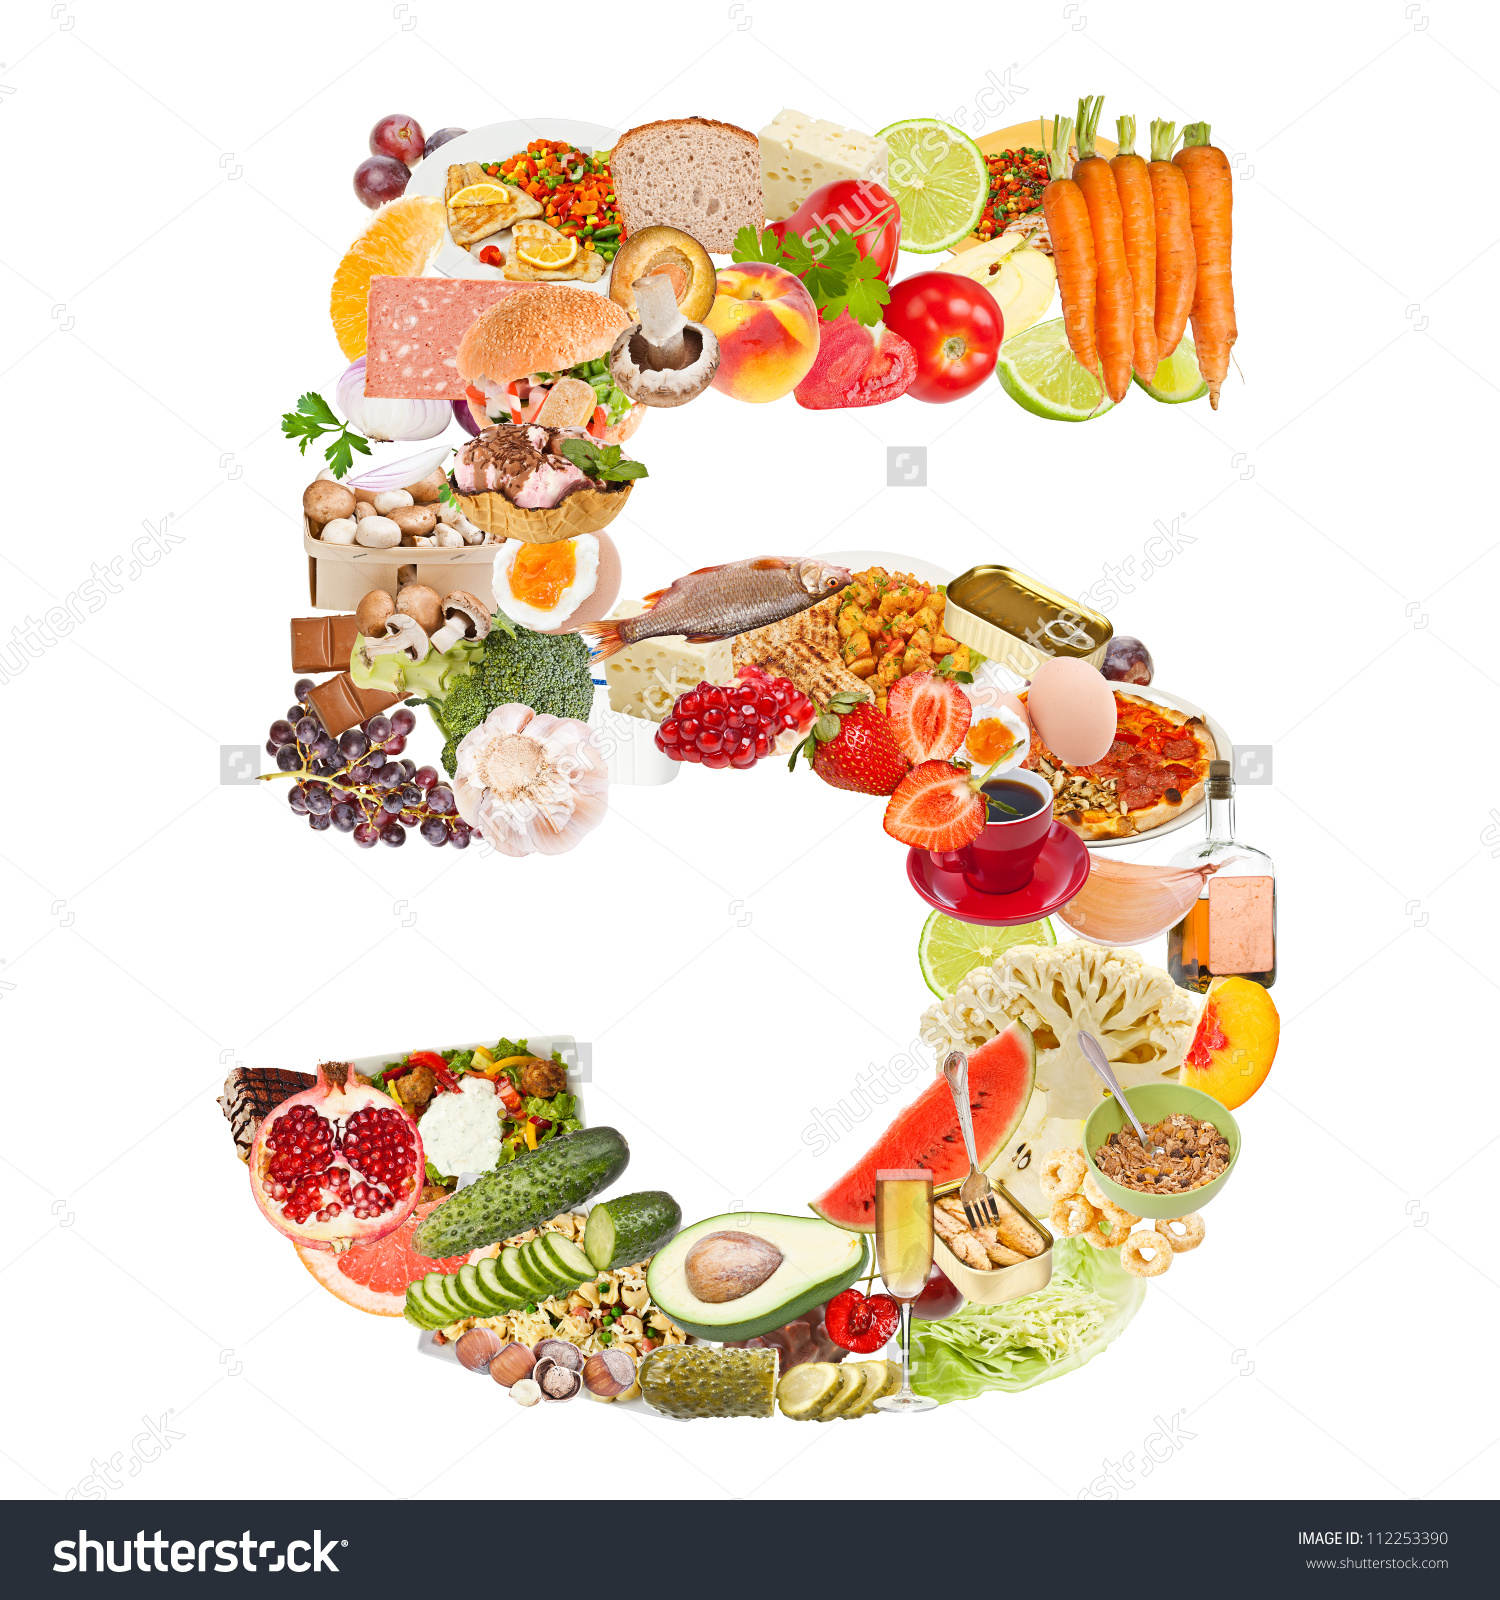 Nutrients PowerPoint copy1 on emaze